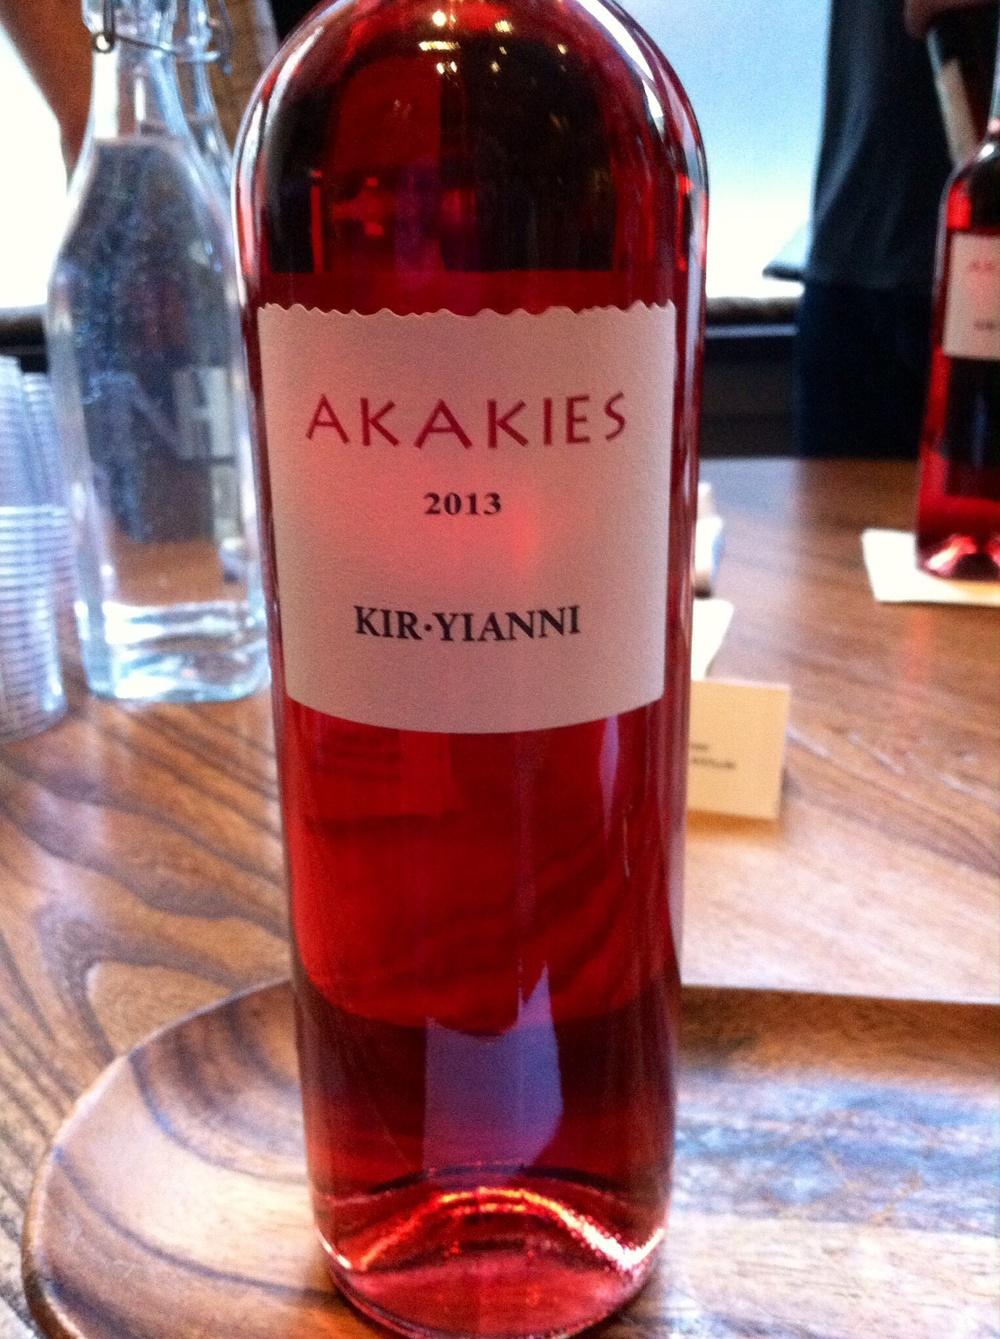 Akakies, Kir-Yianni, Greece, 2013. Photo by Shana Sokol, Shana Speaks Wine.